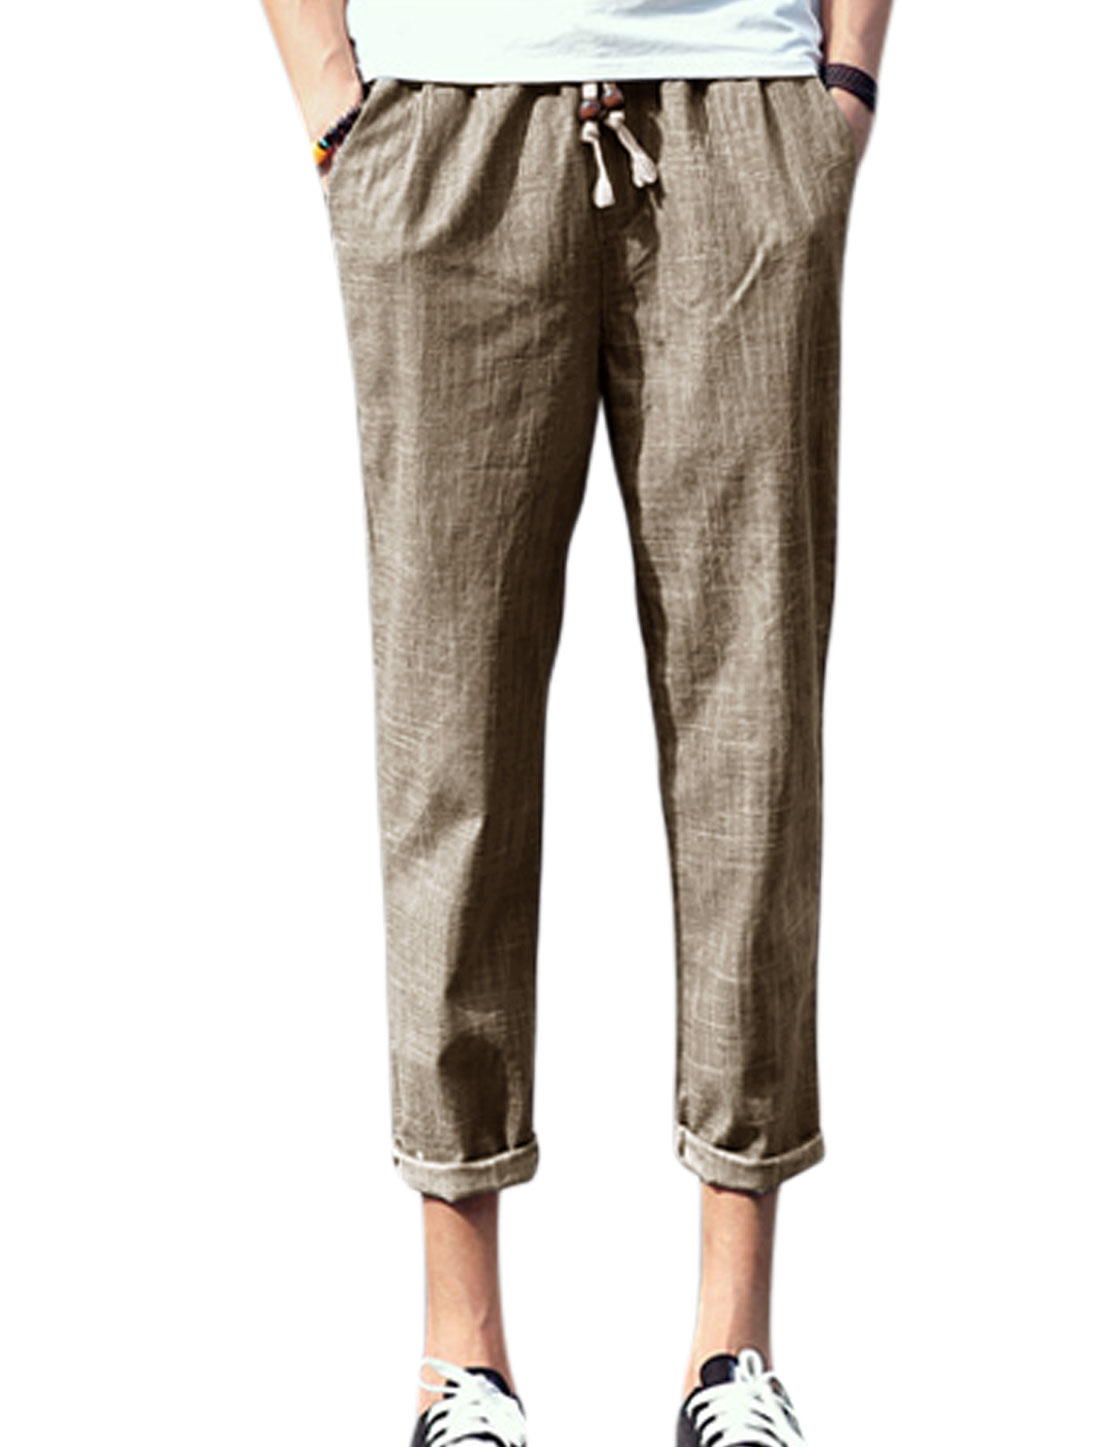 Man Elastic Drawstring Waist Well-fitting Casual Cropped Pants Dark Beige W30